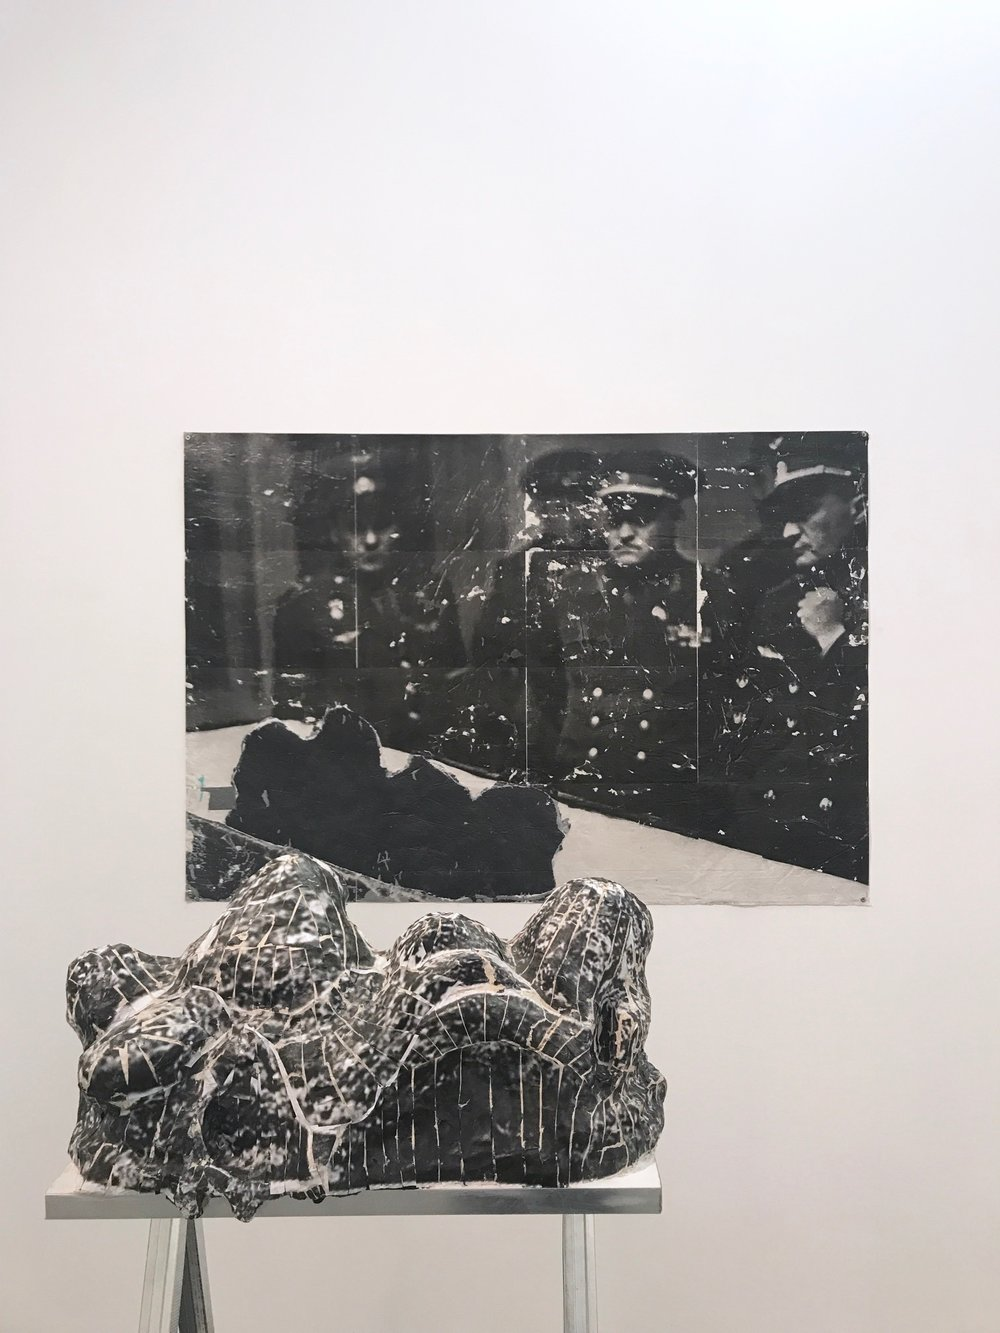 Baris Gokturk, Untitled (The Kozmanaut) , 2016